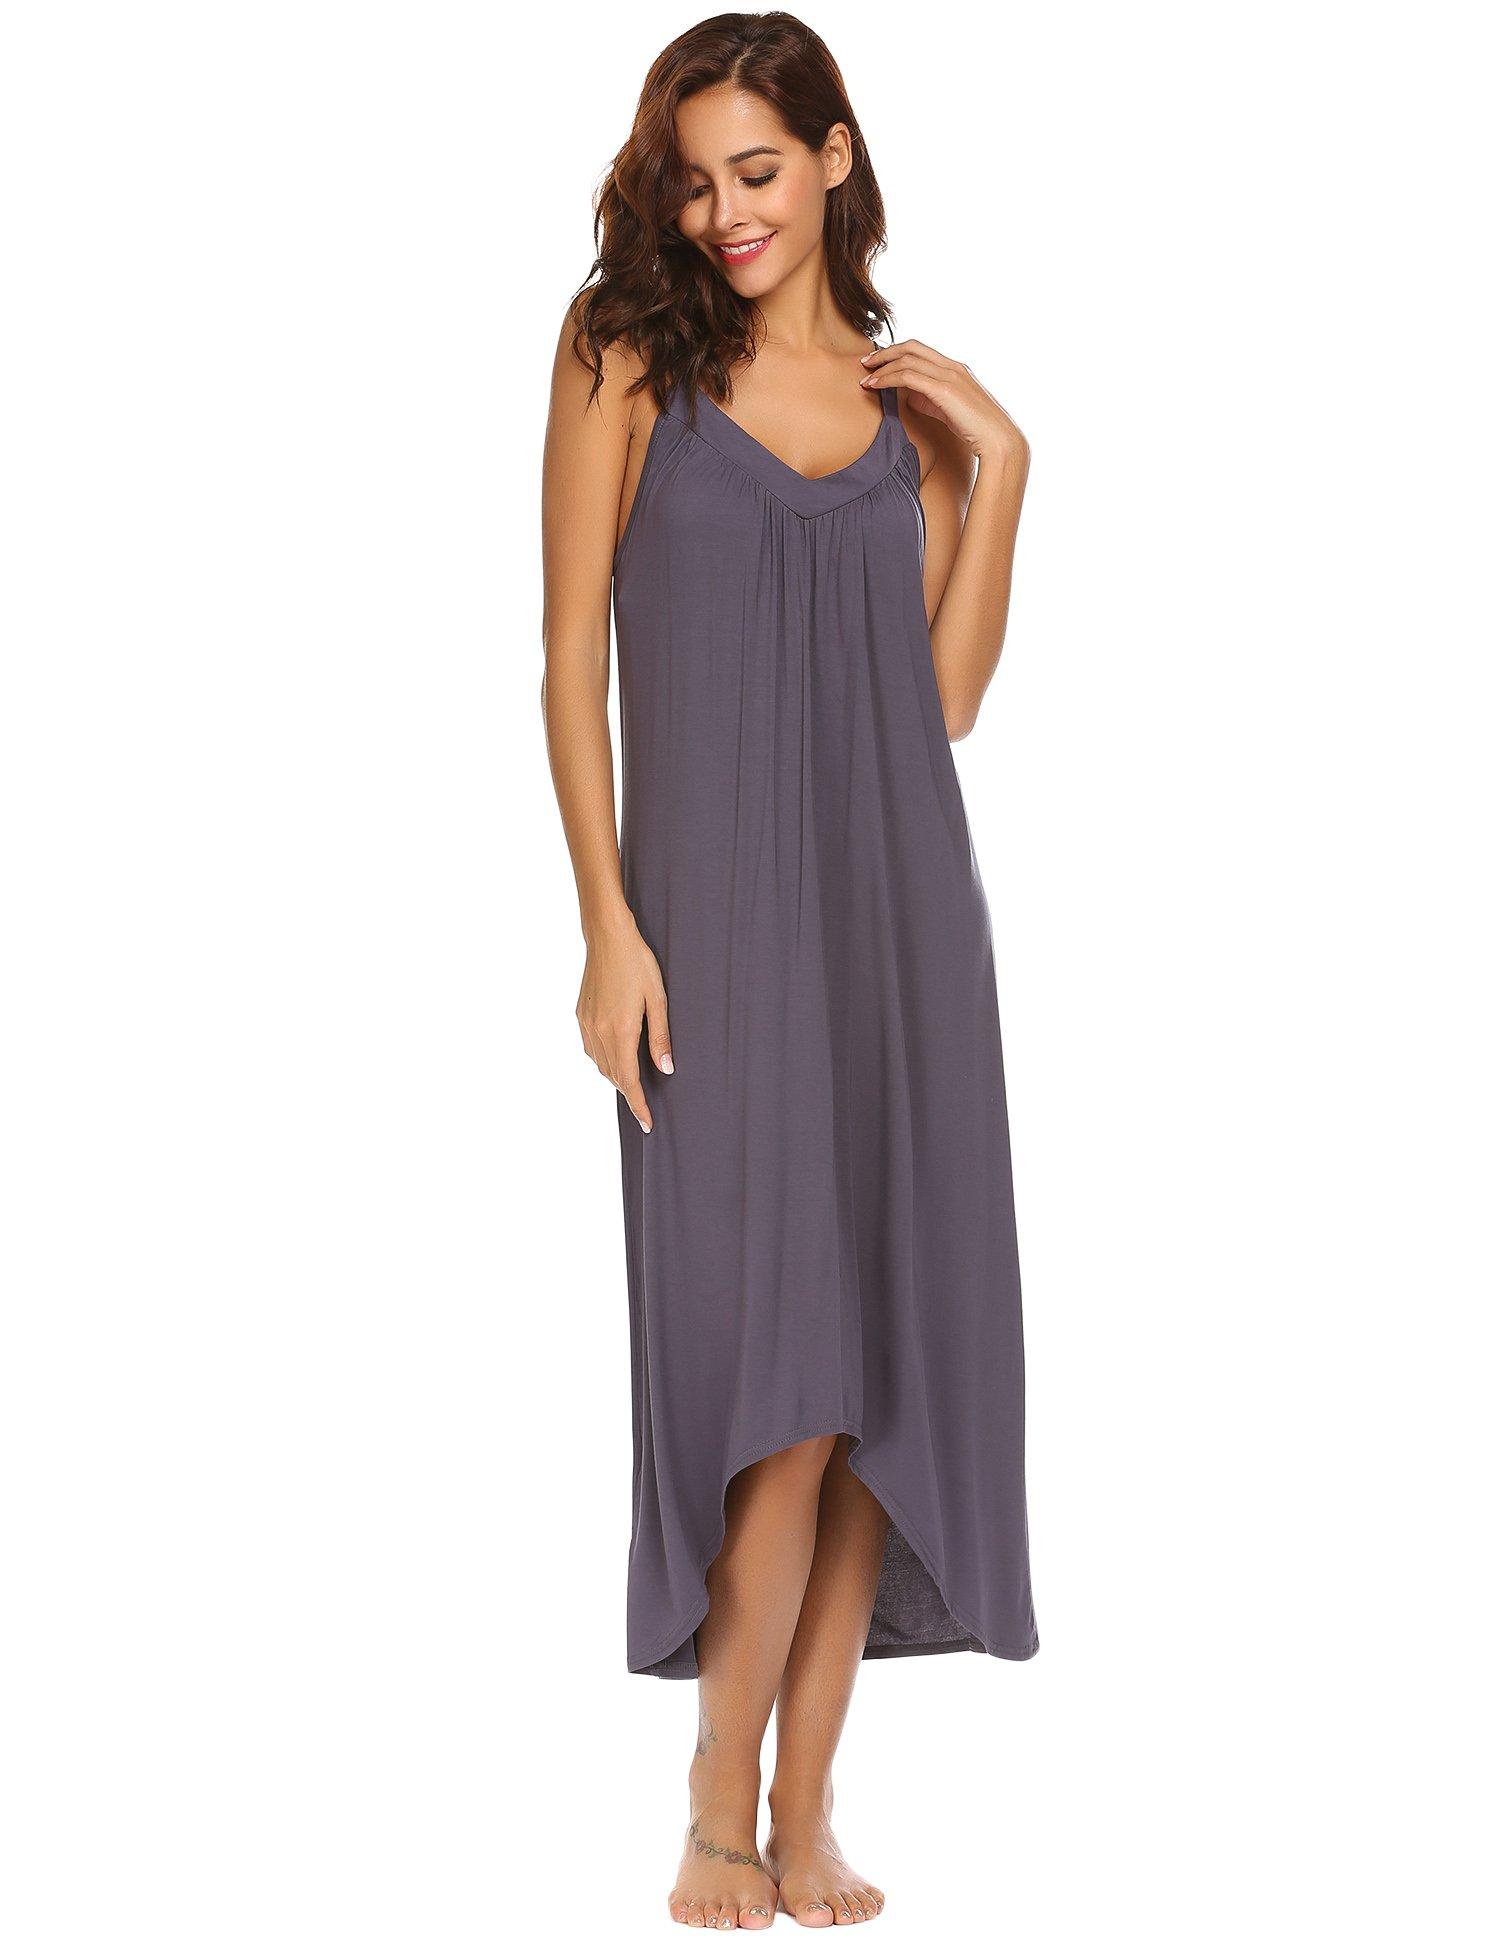 Ekouaer Womens Sleeveless Long Nightgown Summer Slip Night Dress Cotton Sleepshirt Chemise,A-dark Grey_6696,Small by Ekouaer (Image #3)